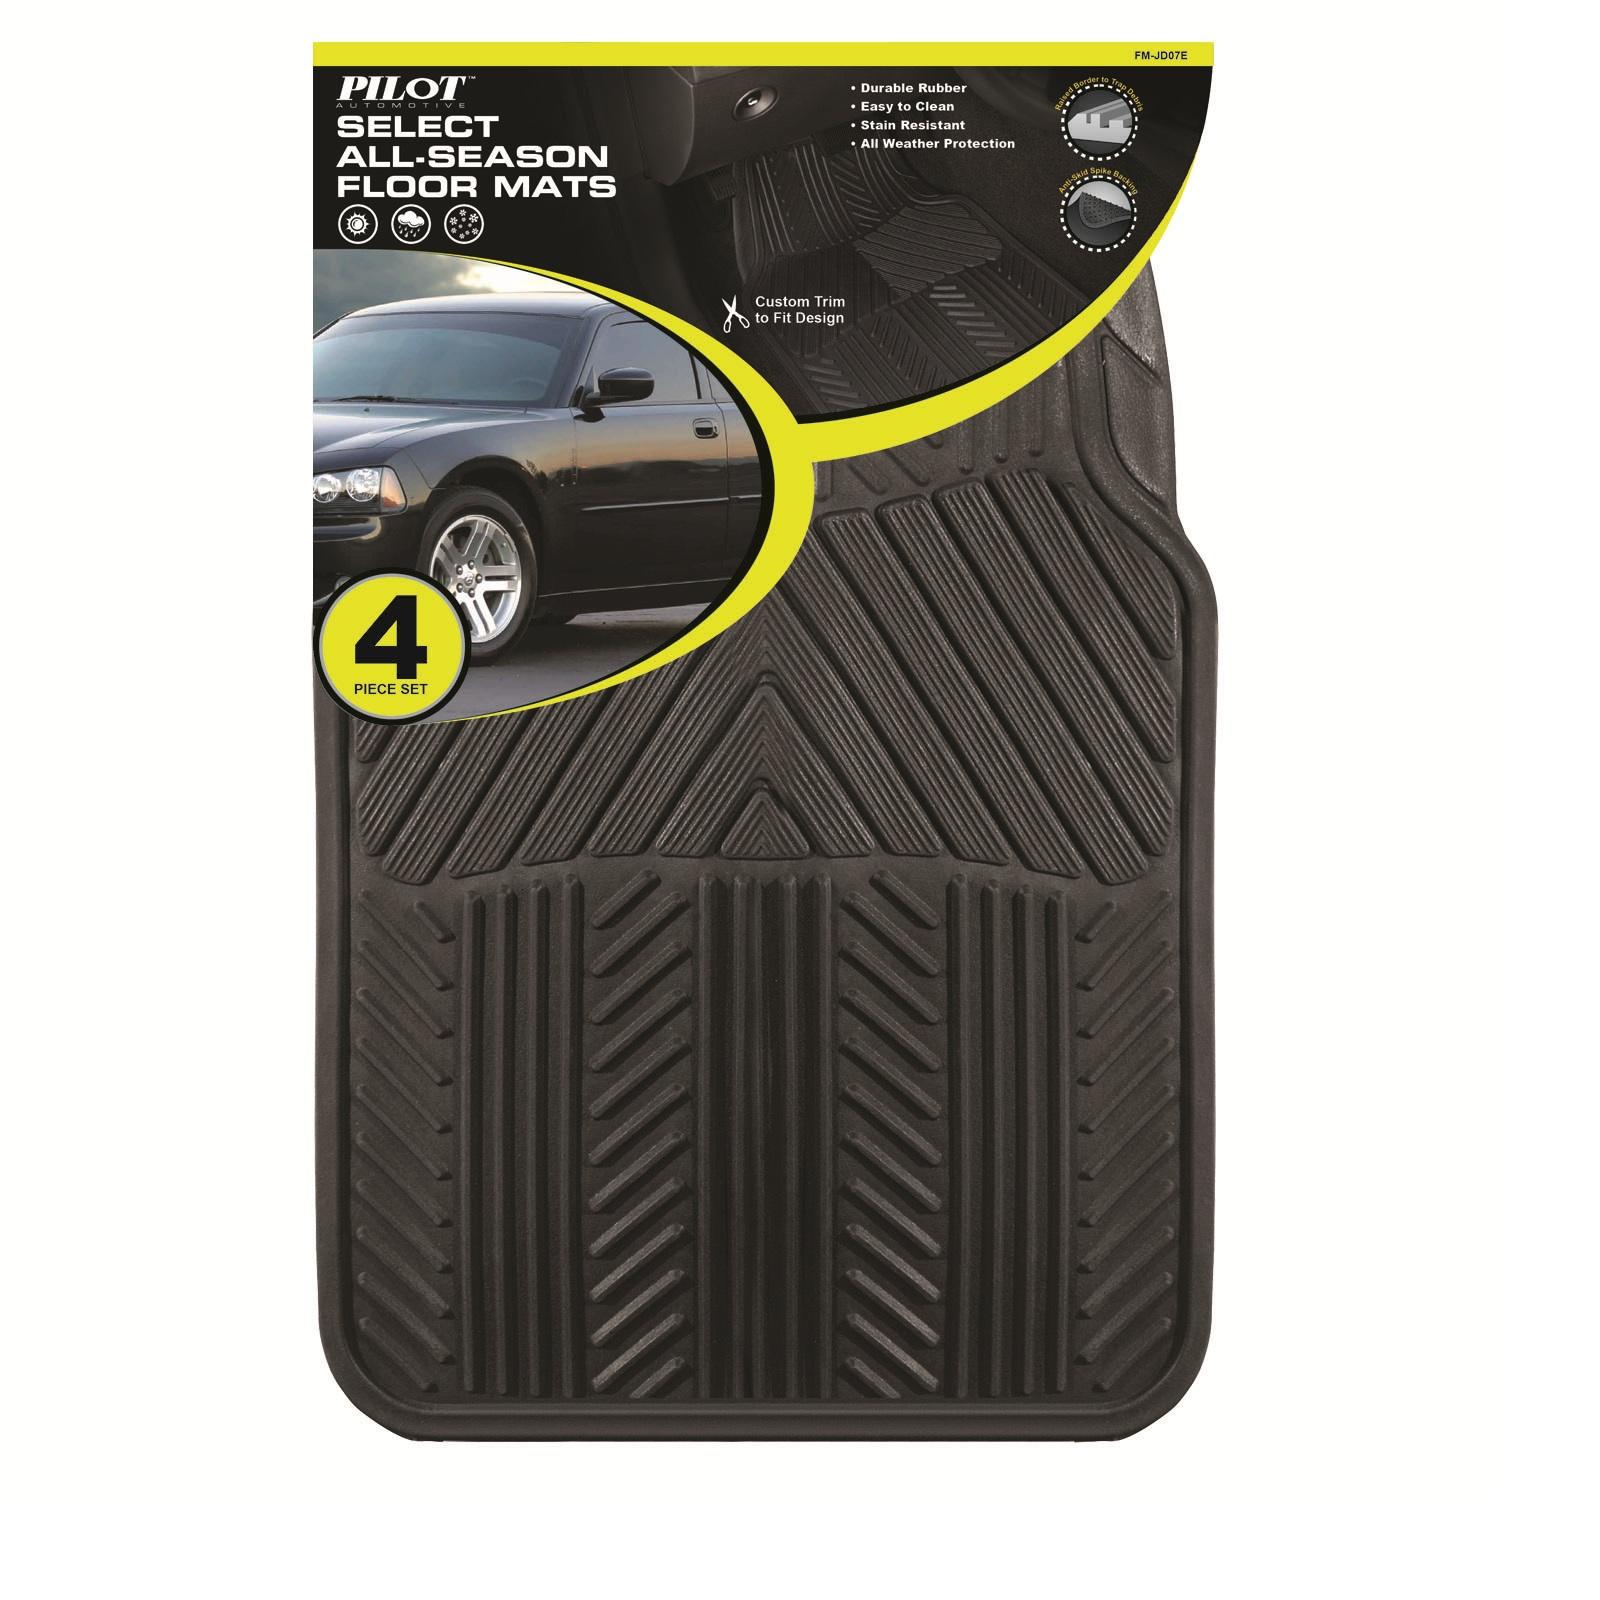 4-Piece Pilot Automotive All Season Rubber Floor Mat Set  $9.99 + Free Store Pickup ~ Sears